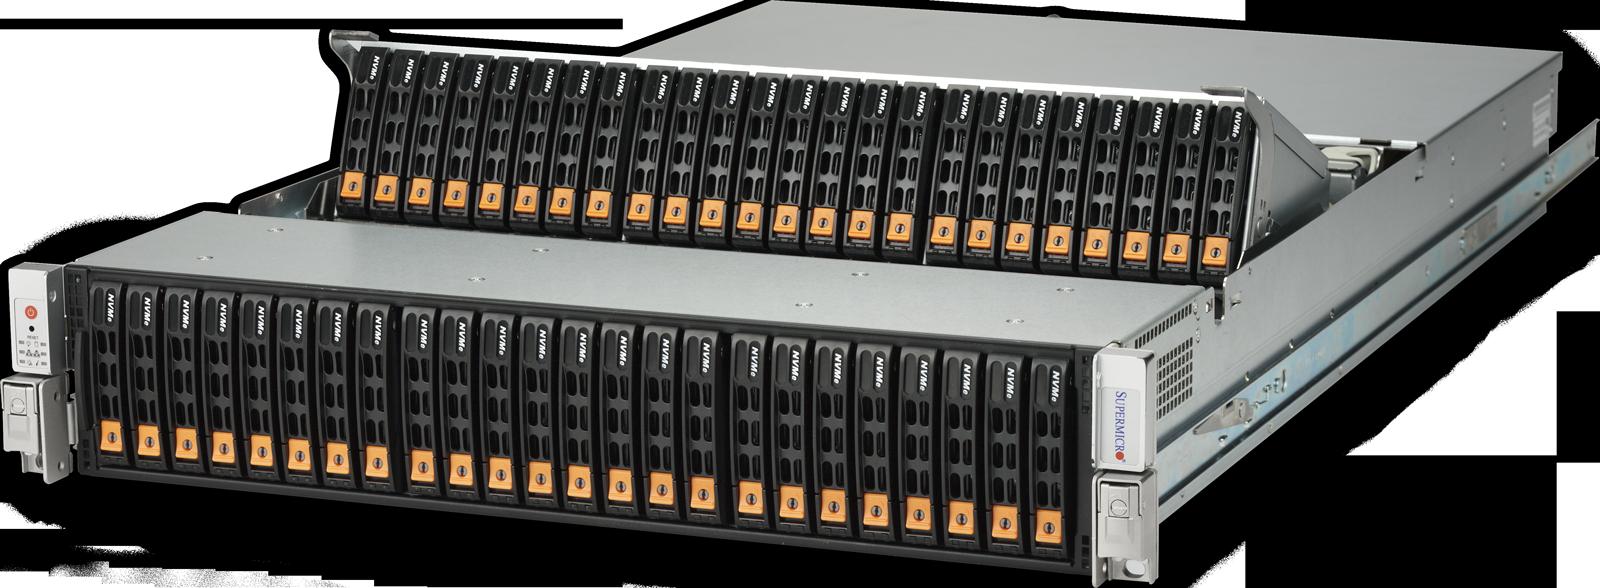 Dakota Server Storage & Microcloud Solutions   Intel Xeon